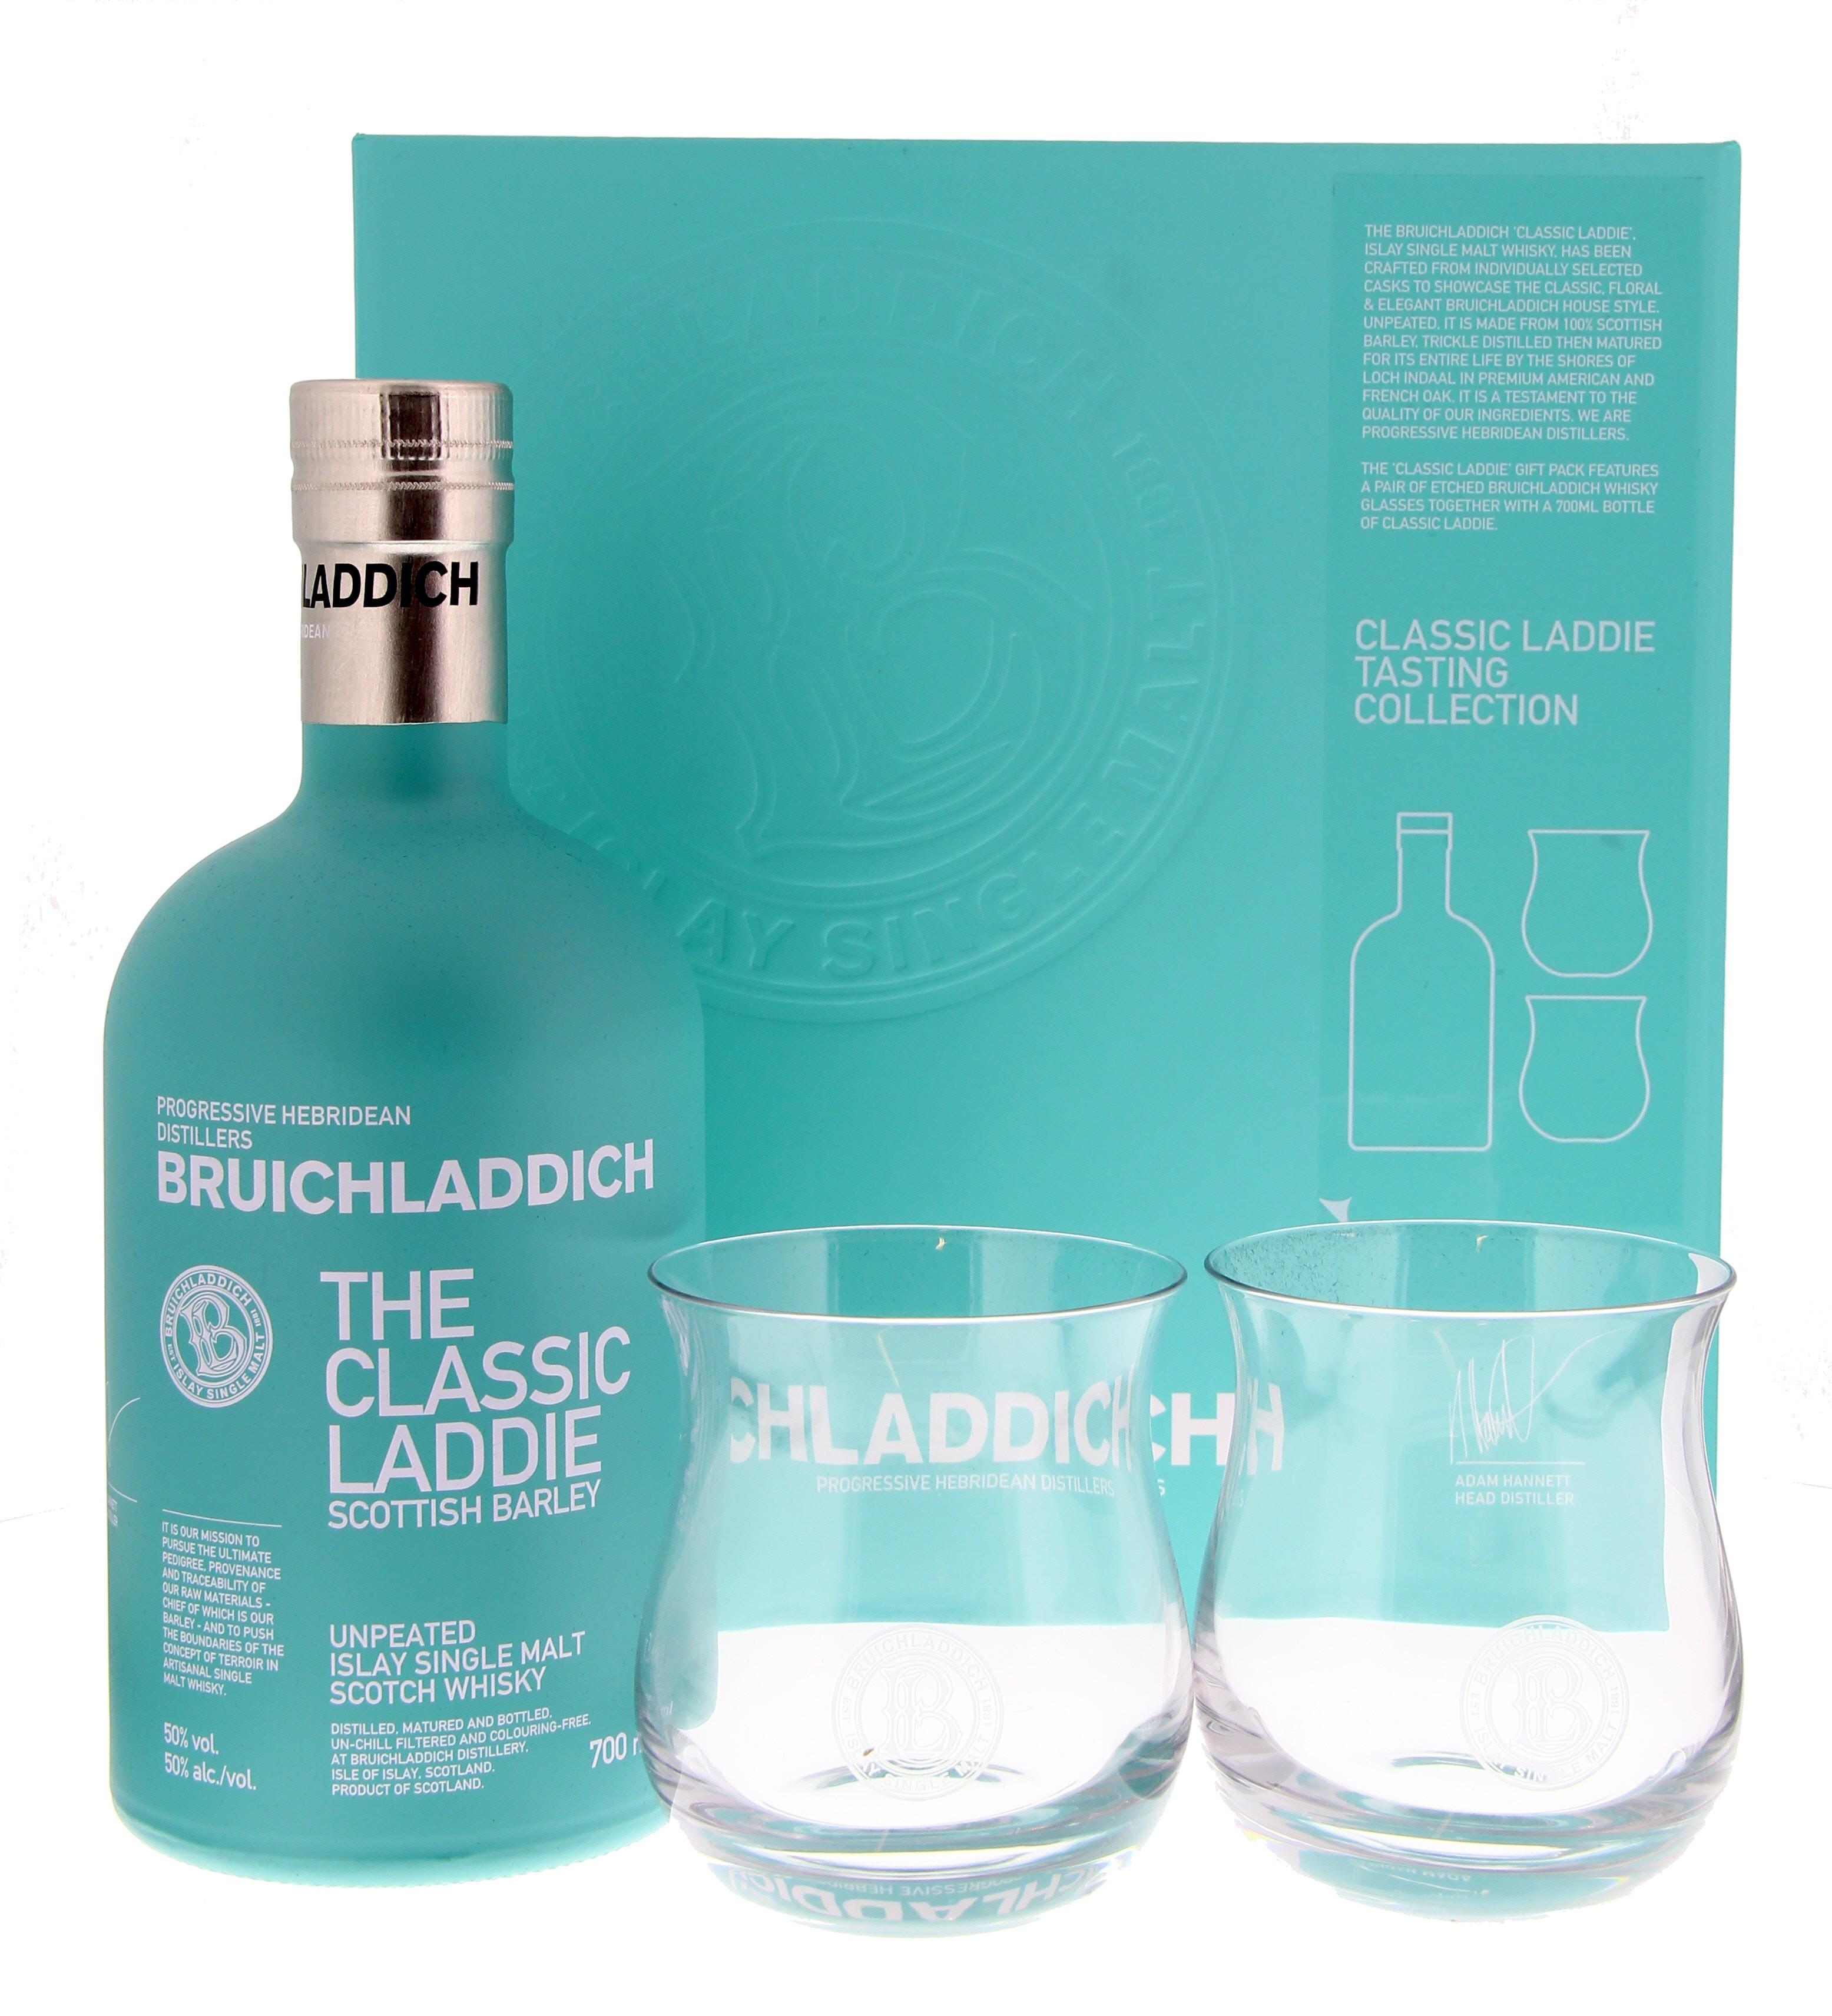 Bruichladdich Scottish Barley The Classic Laddie + 2 glasses 50° 0.7L